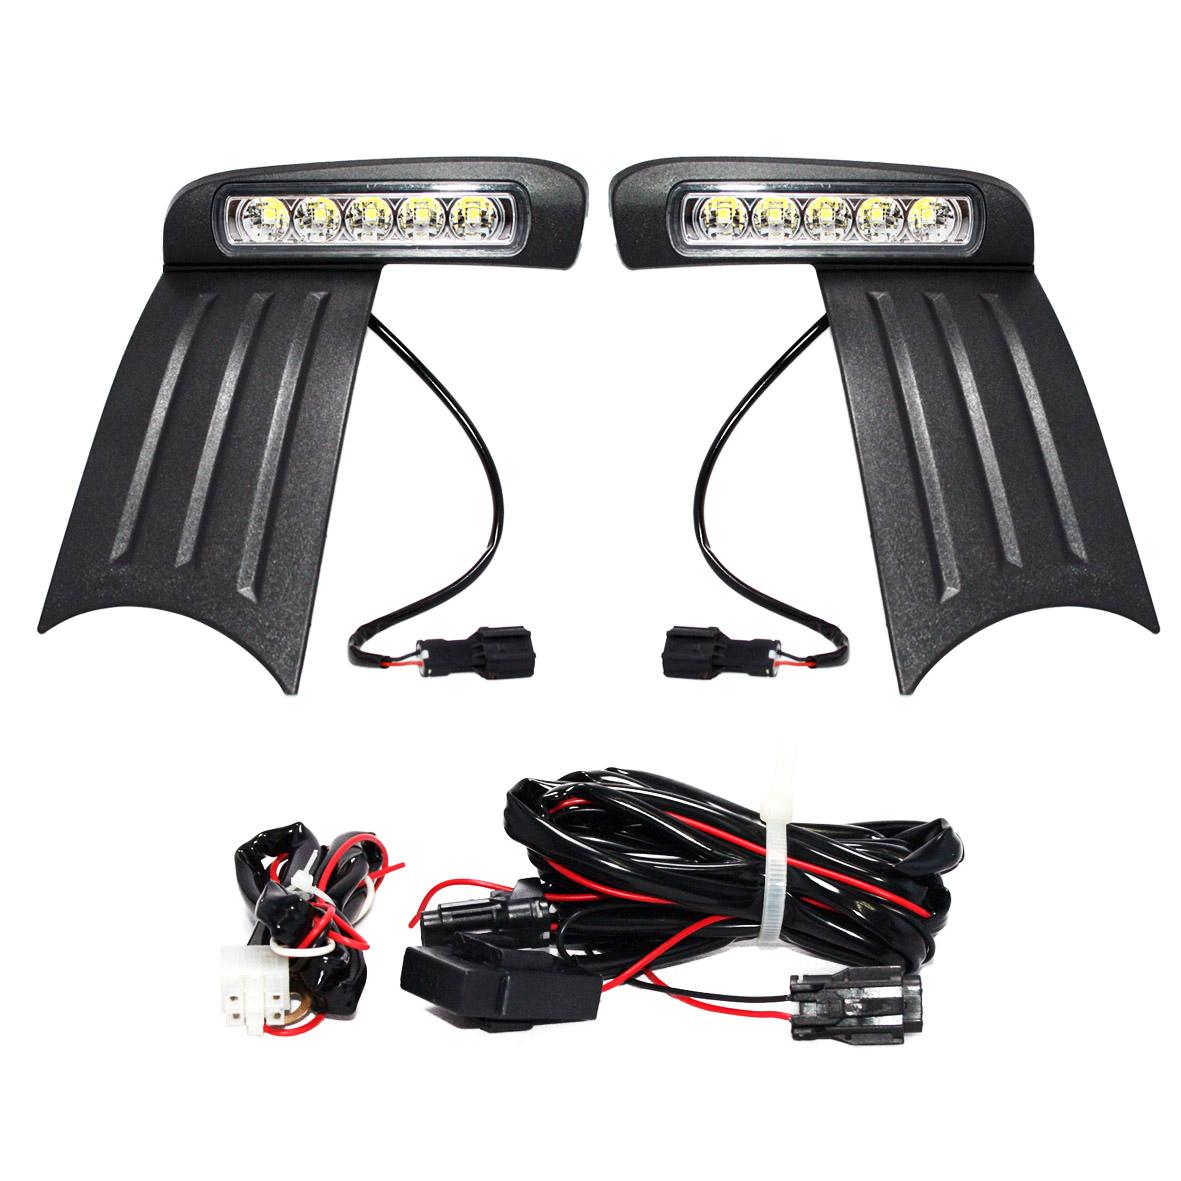 OTOmobil Lampu DRL Fog Lamp Honda Jazz 2012 AI-AK390